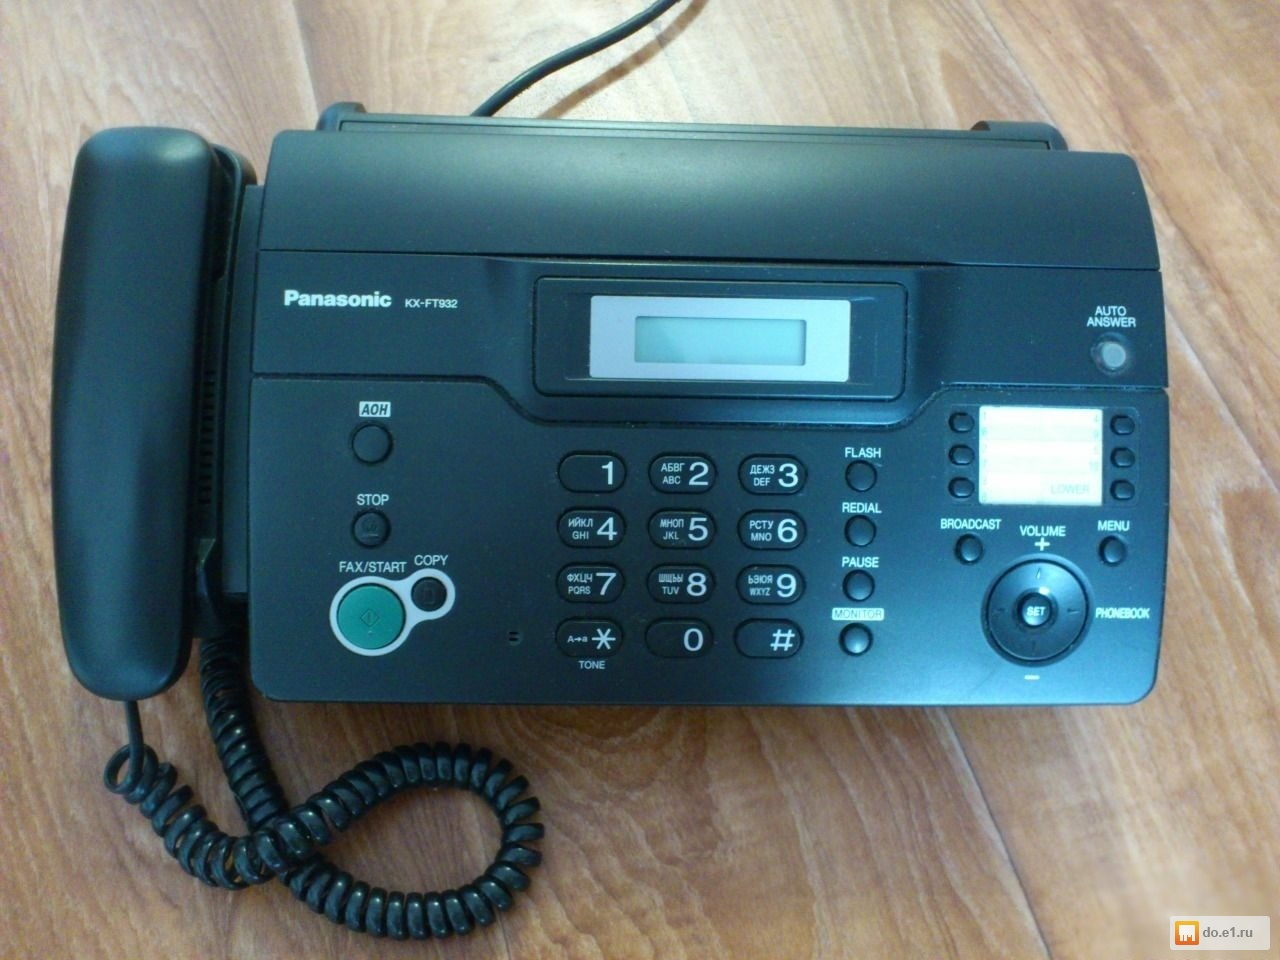 инструкция по эксплуатации canon fax l220